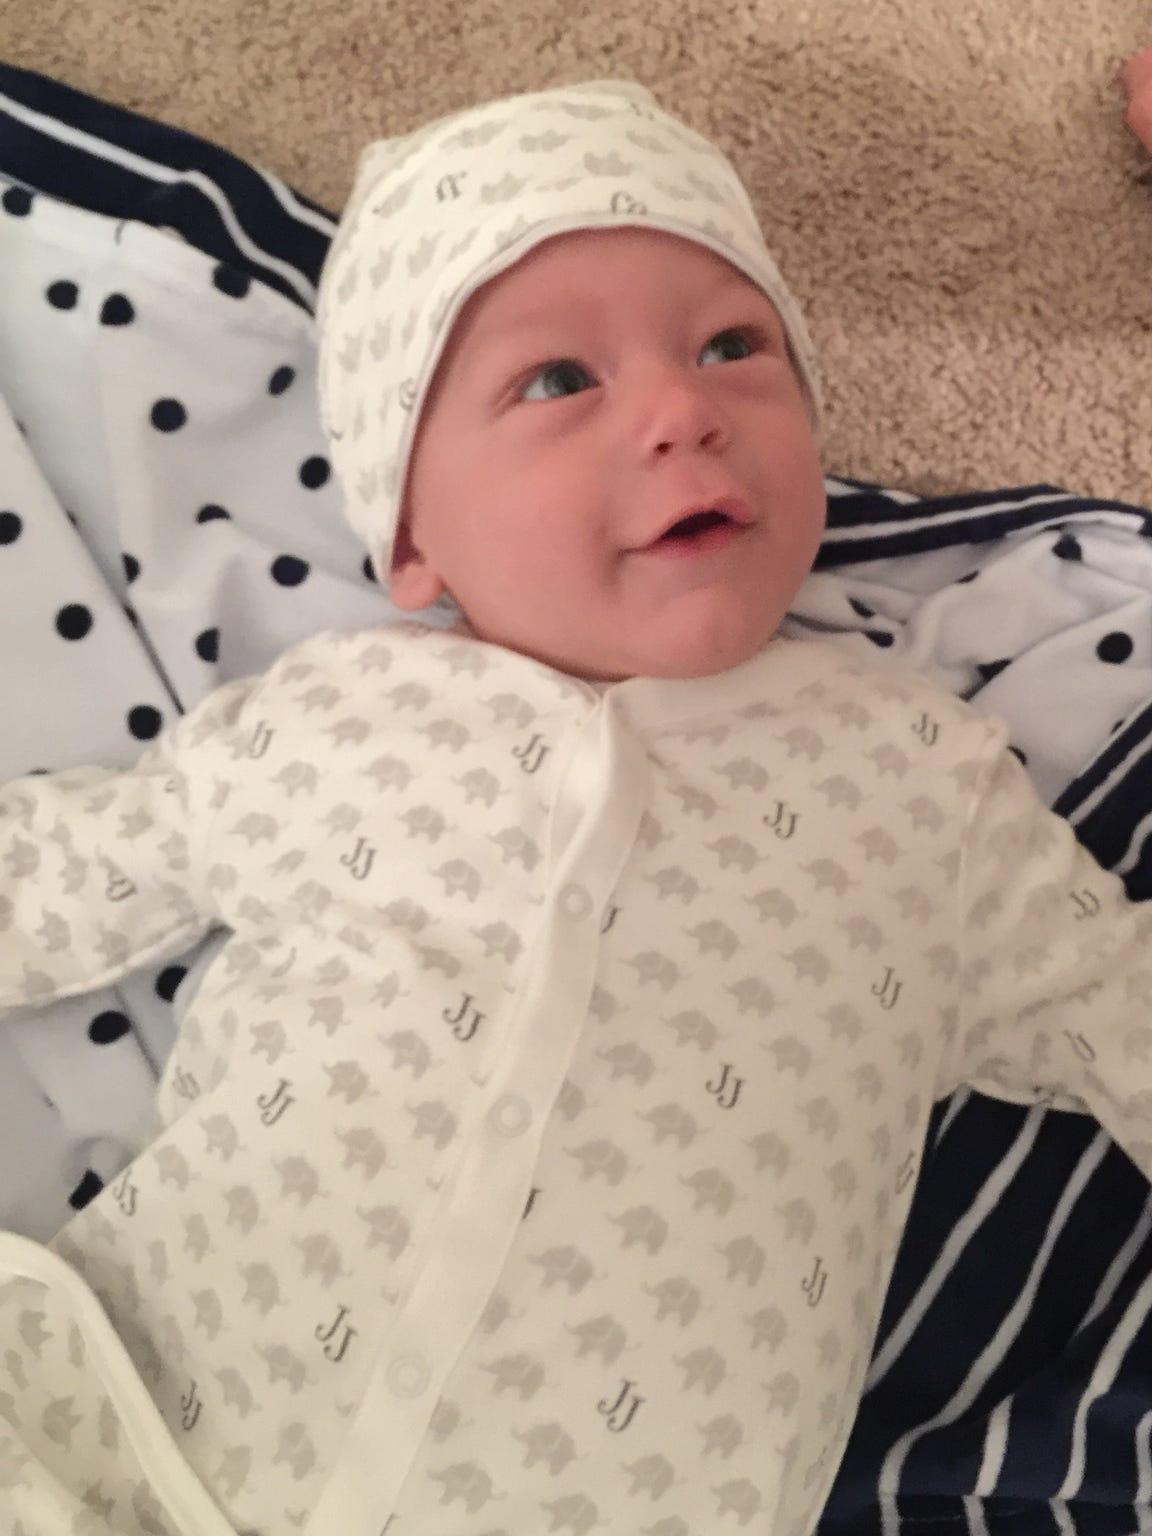 """Baby Em"" Kampen died Feb. 1 due to Leigh's Disease,"